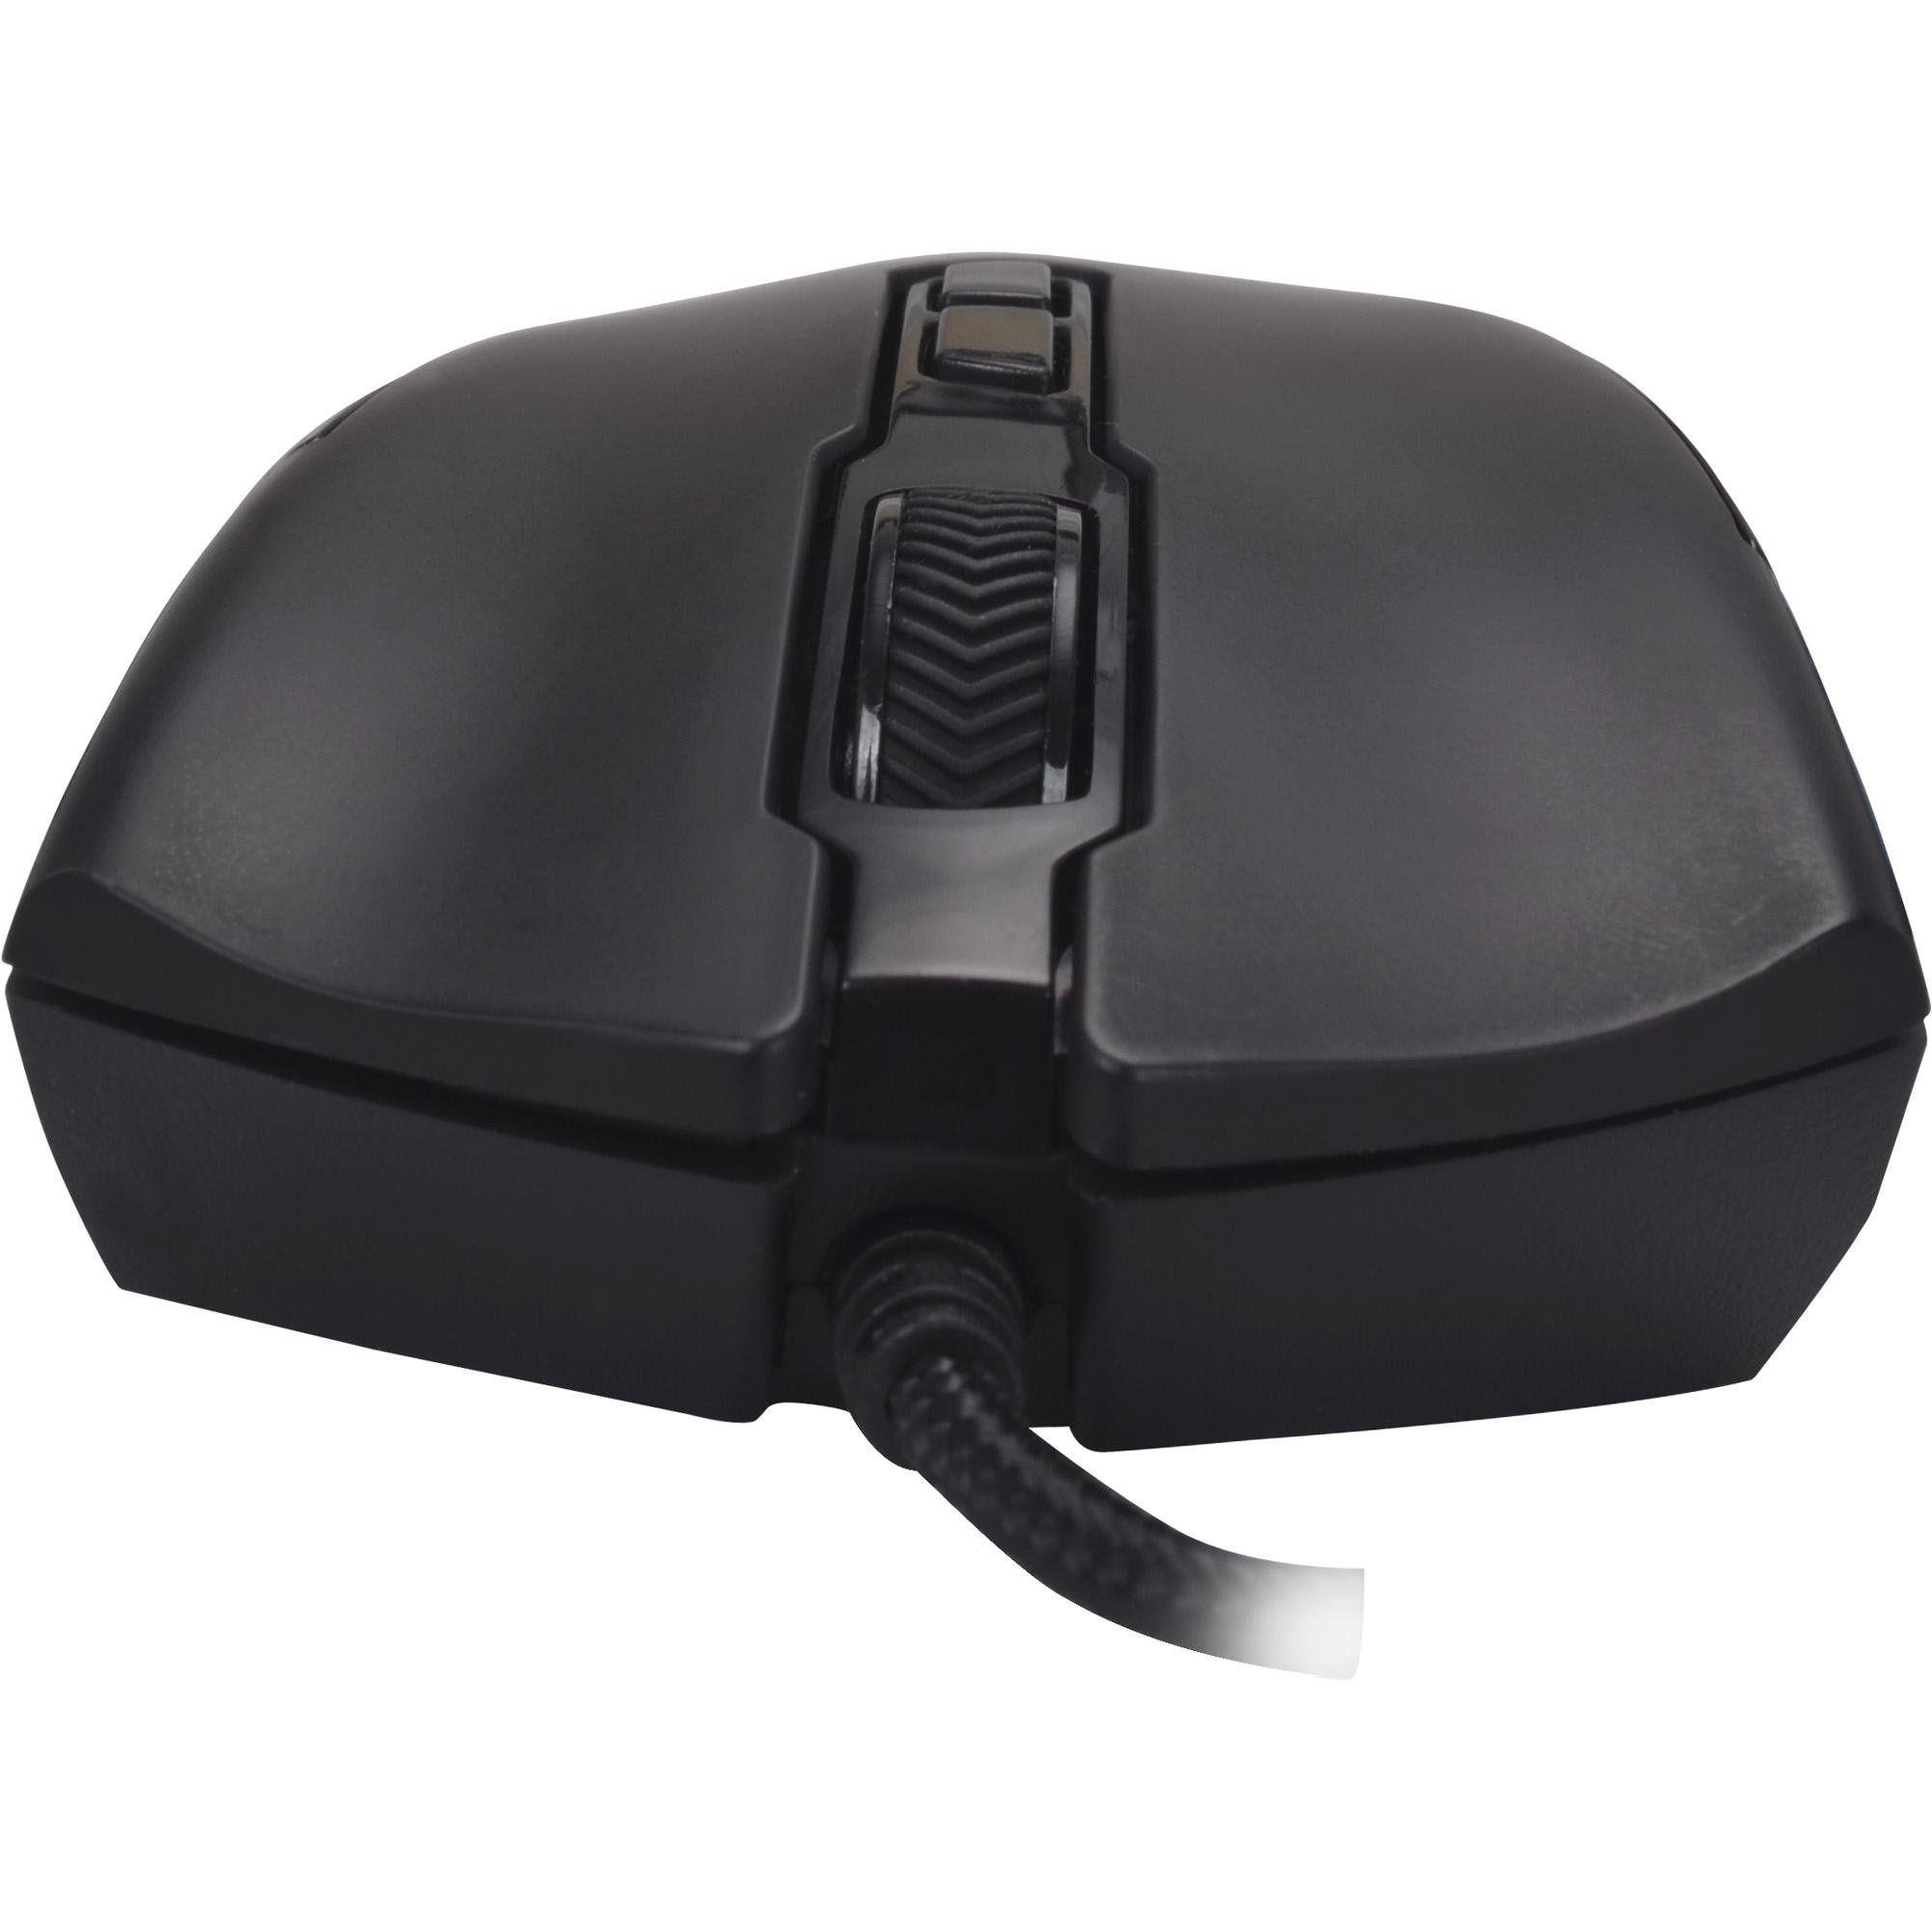 Mouse Gamer Pro M9 RGB 250-4000 DPI Preto Fortrek